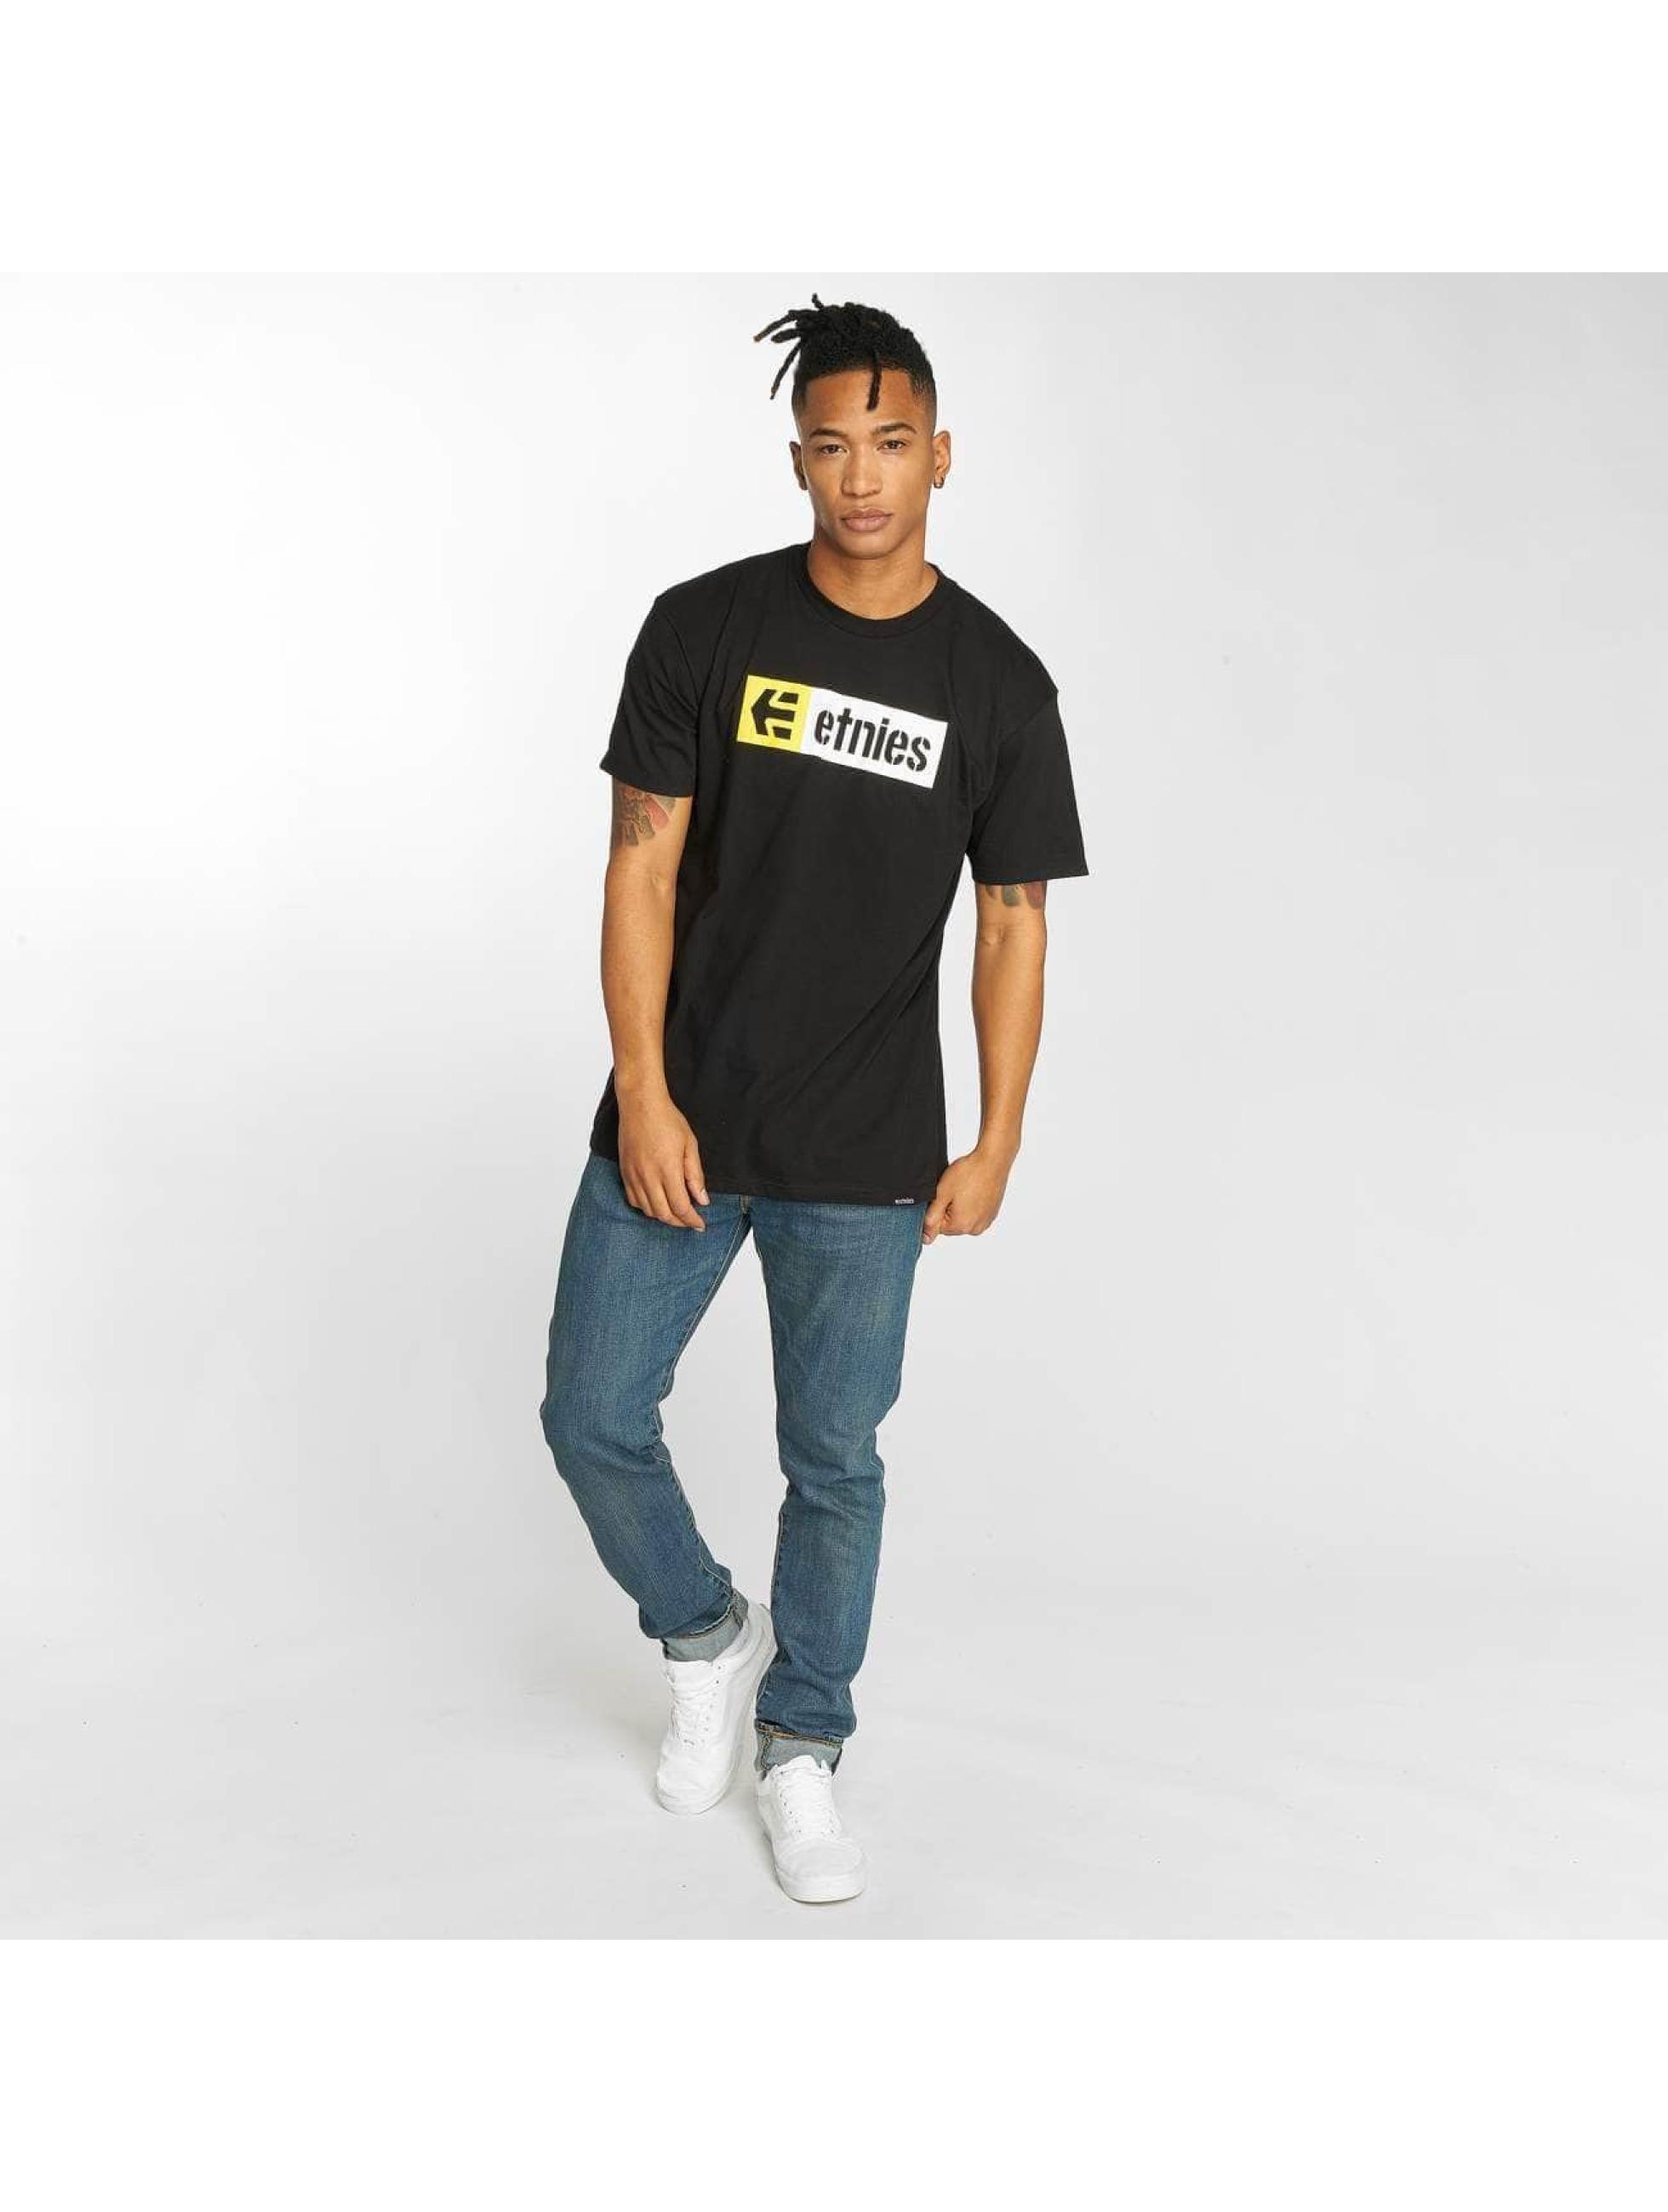 Etnies Camiseta New Box gris